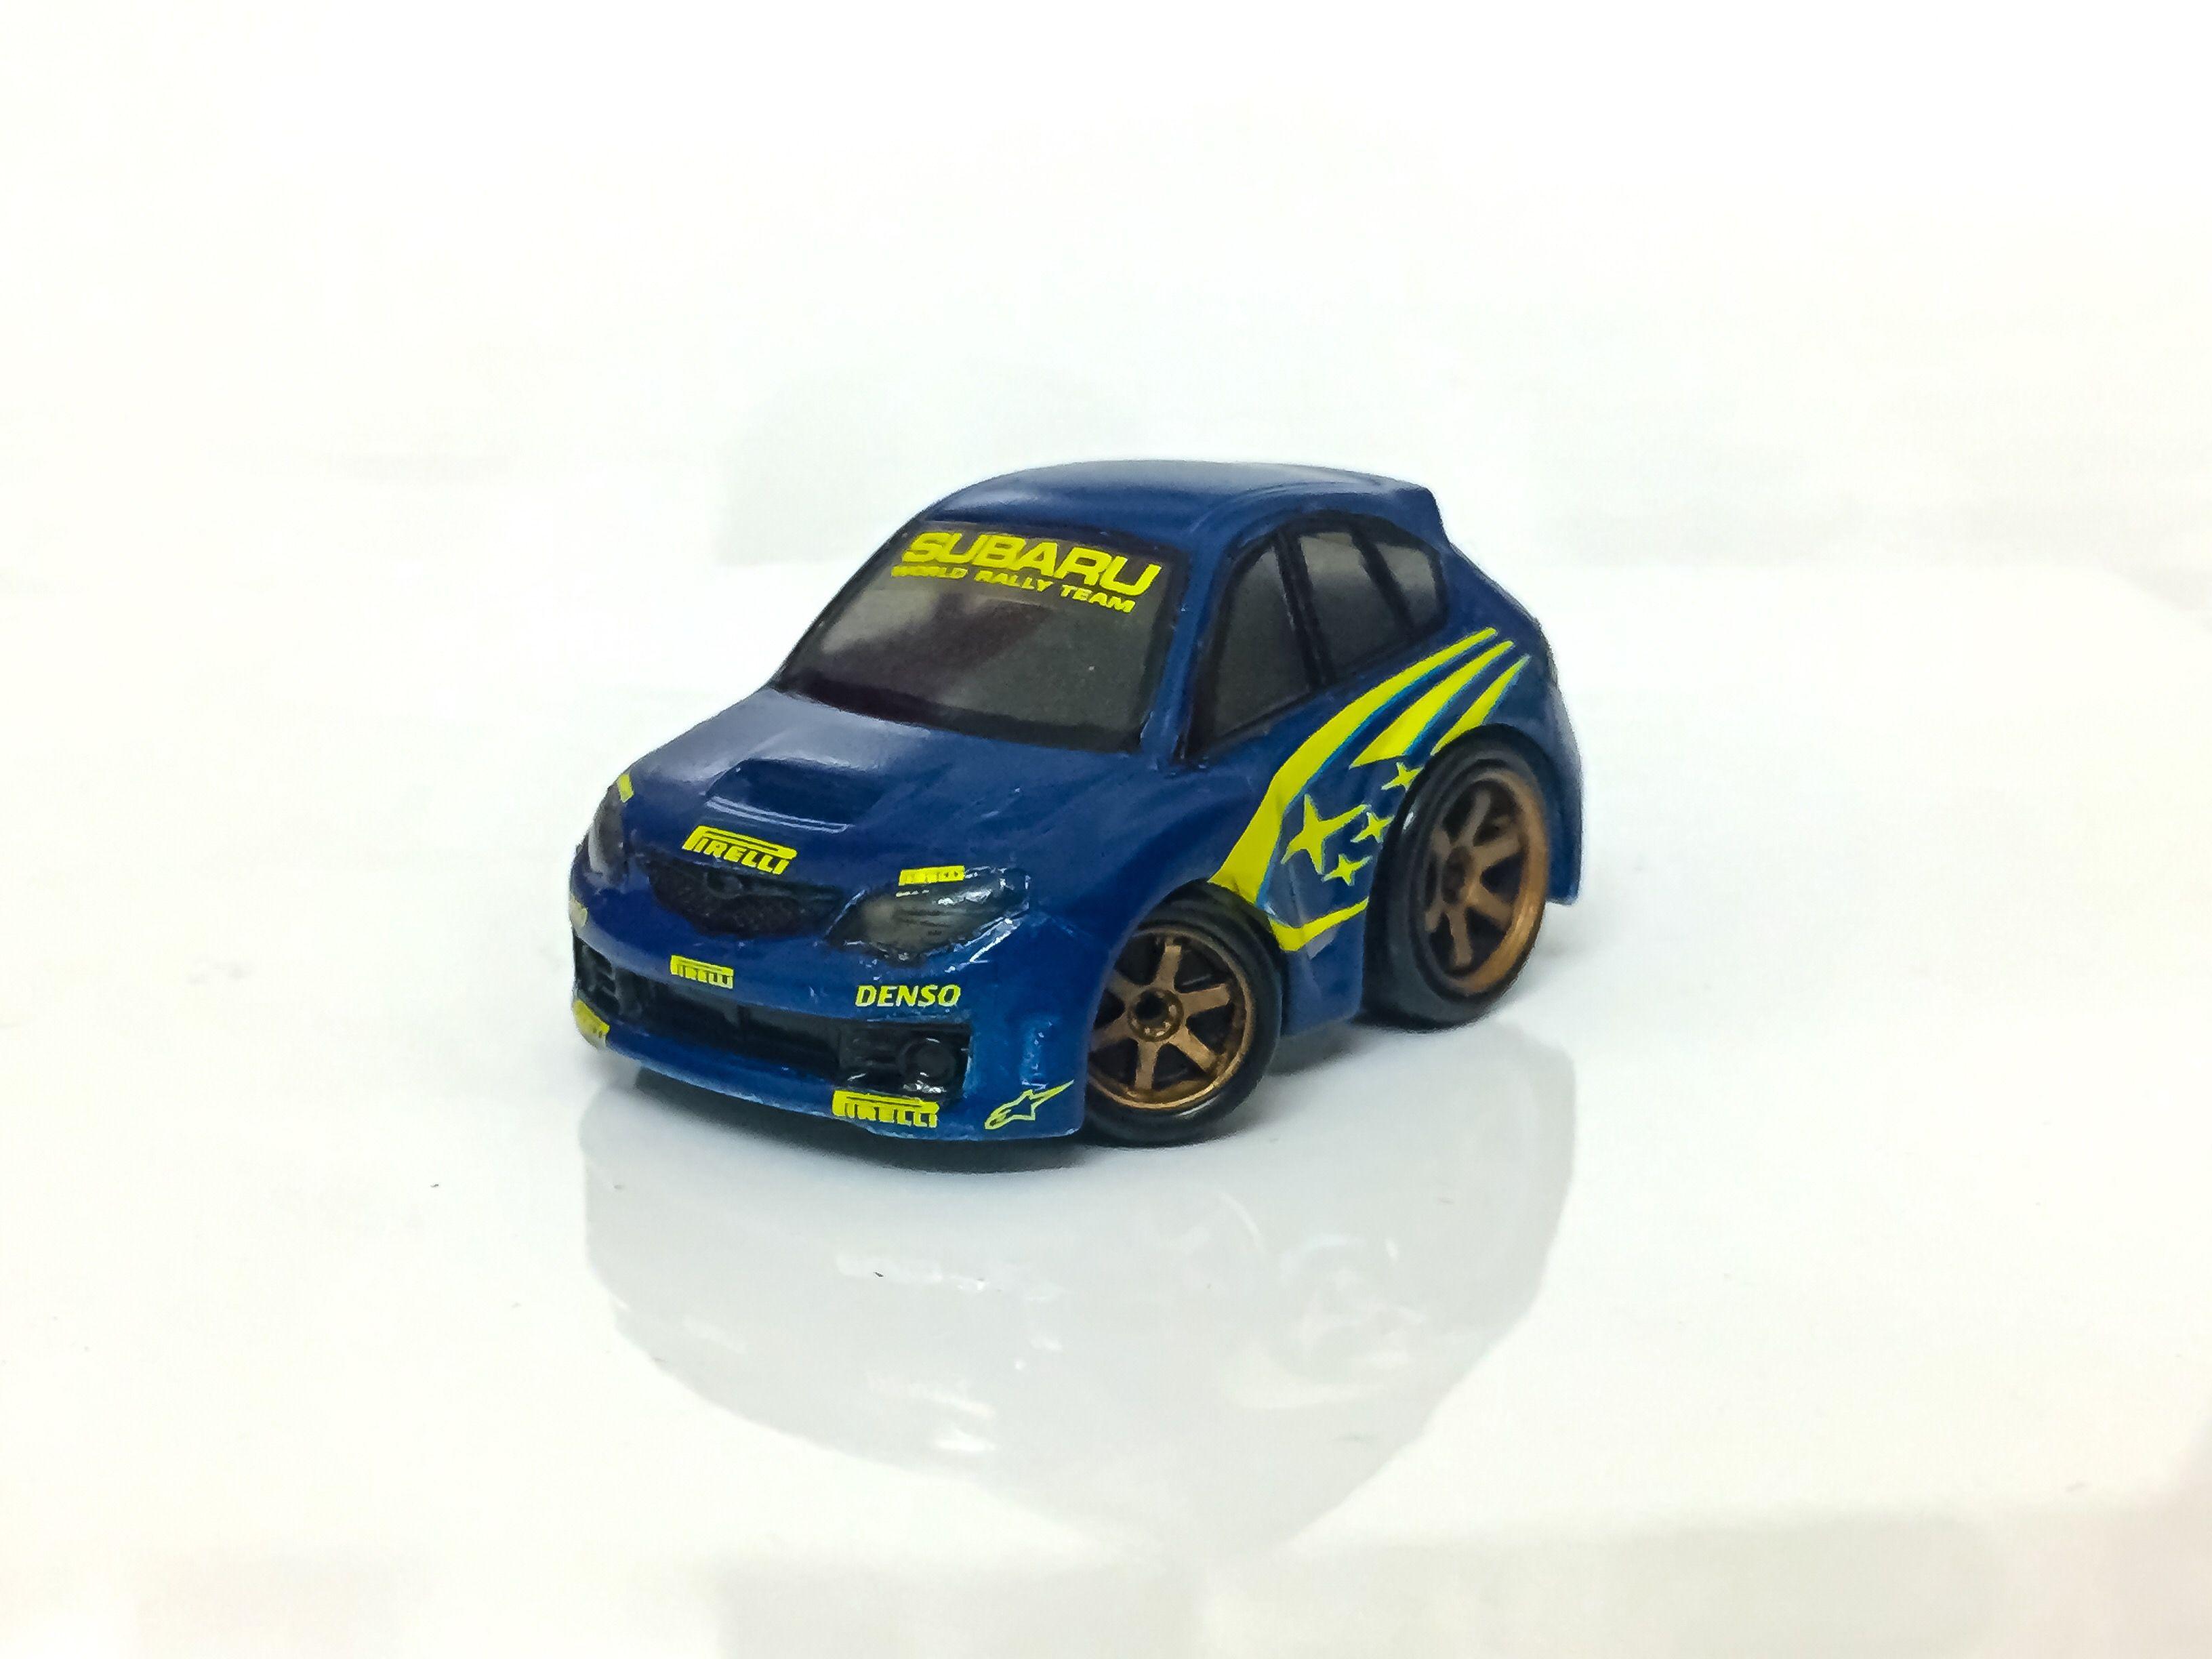 Choro Q Subaru Rally Decal Jiwacustom Rim Mertonsoi Choroq Choro Subaru Subaru Rally Subaru Toy Car